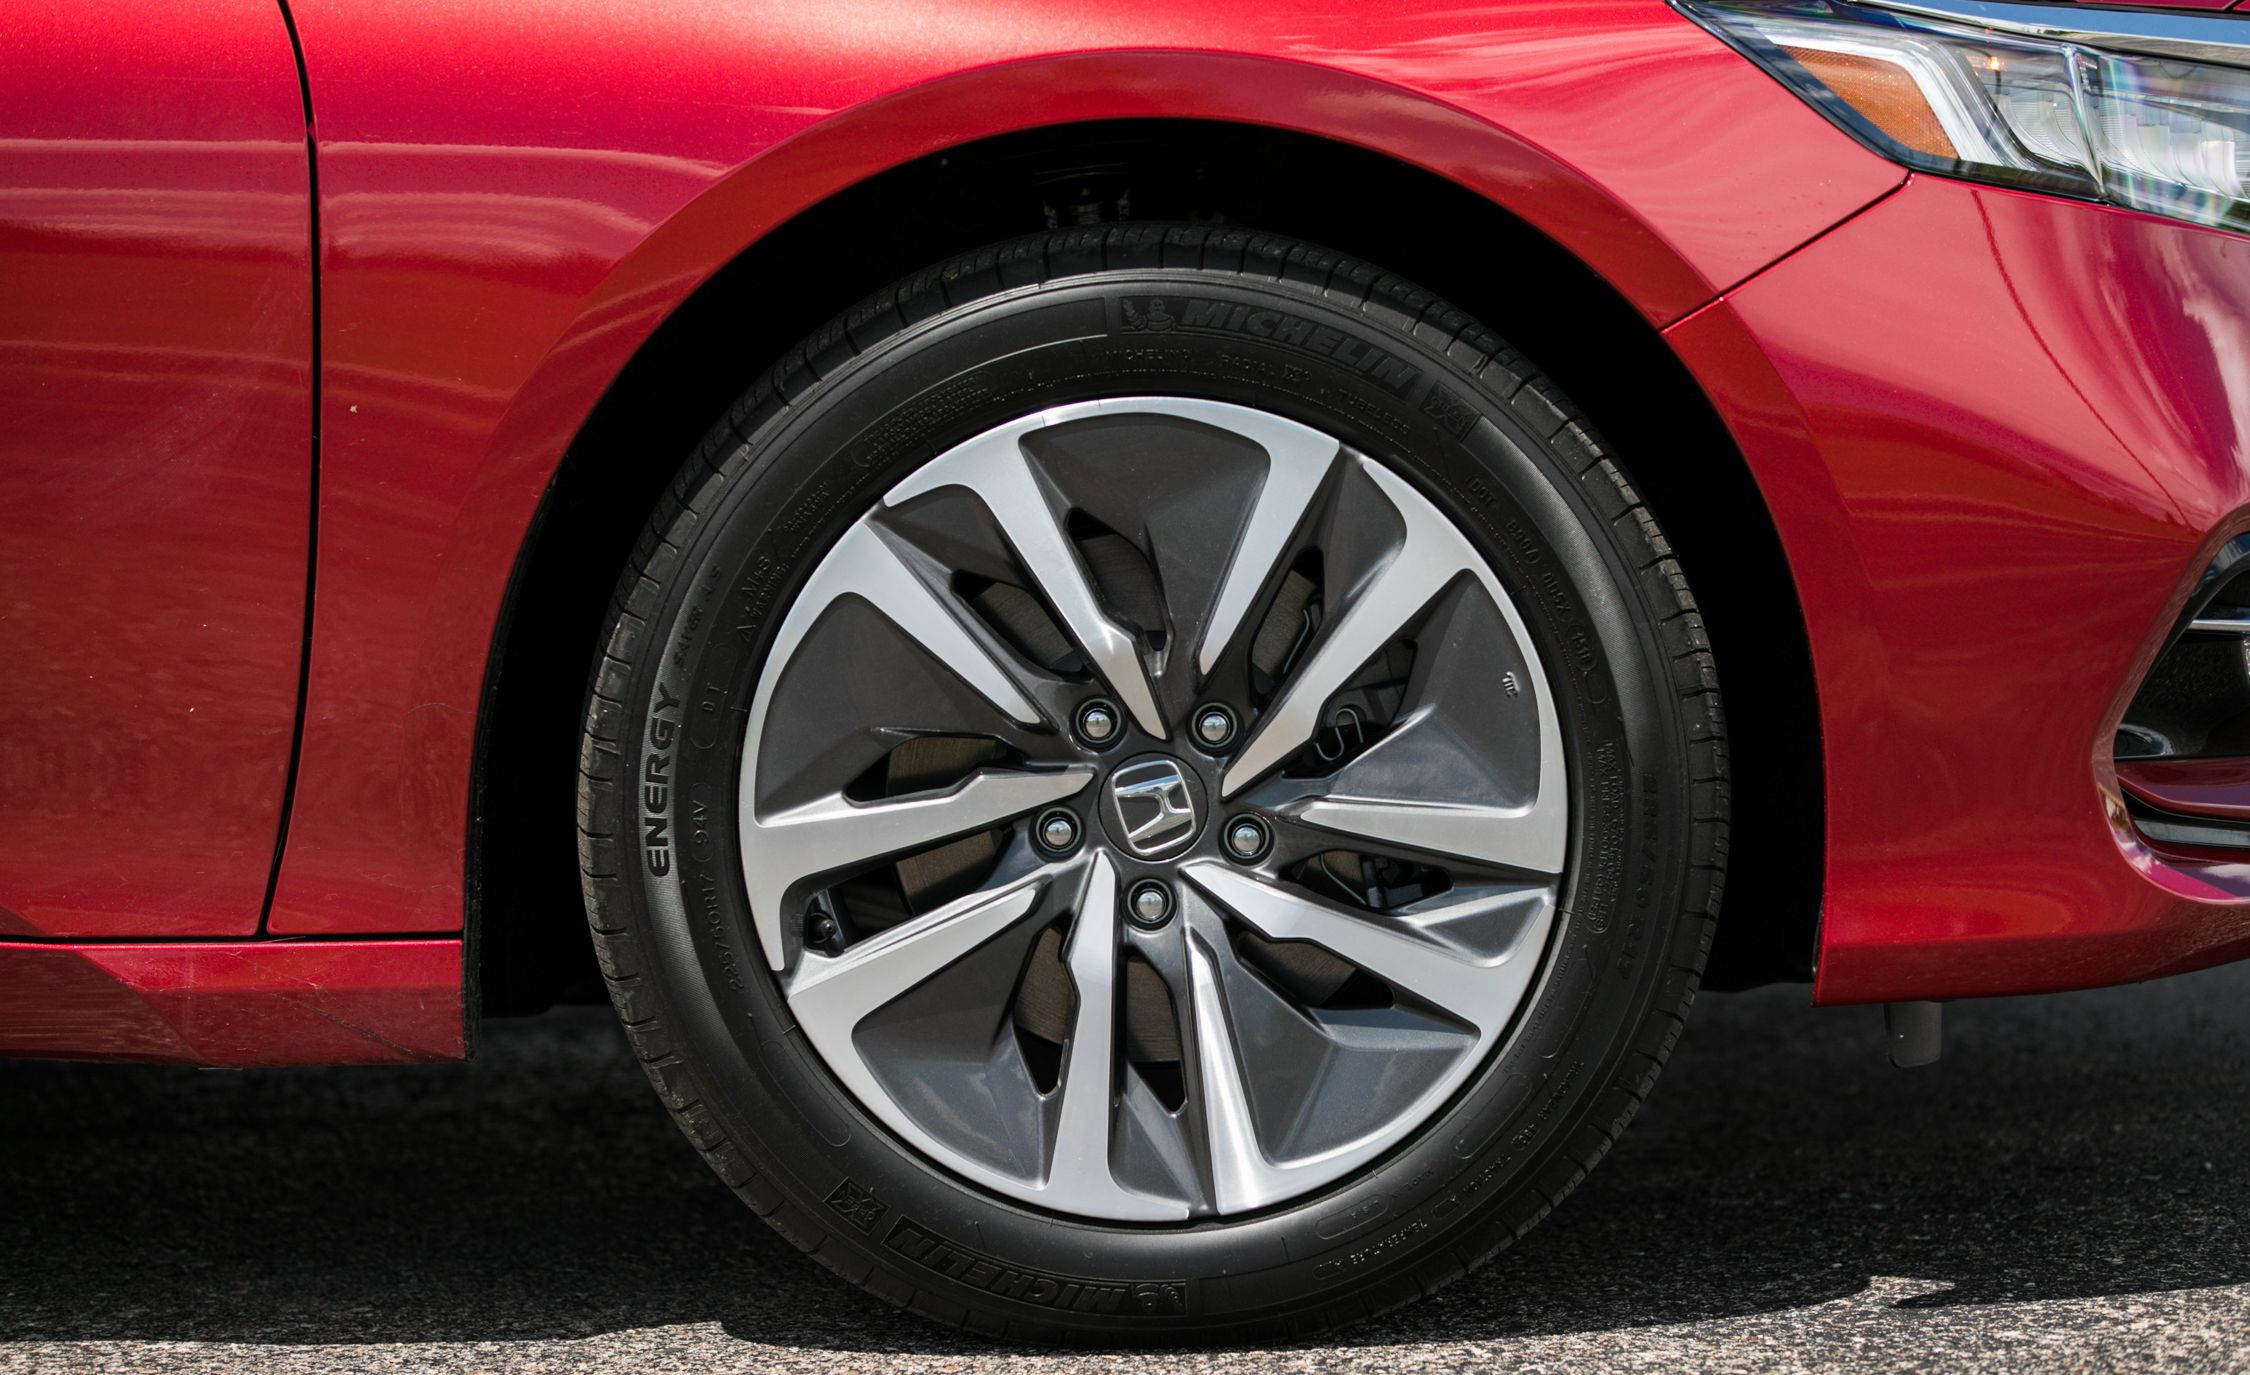 2018 Honda Accord Hybrid Wheel Wallpapers (8)